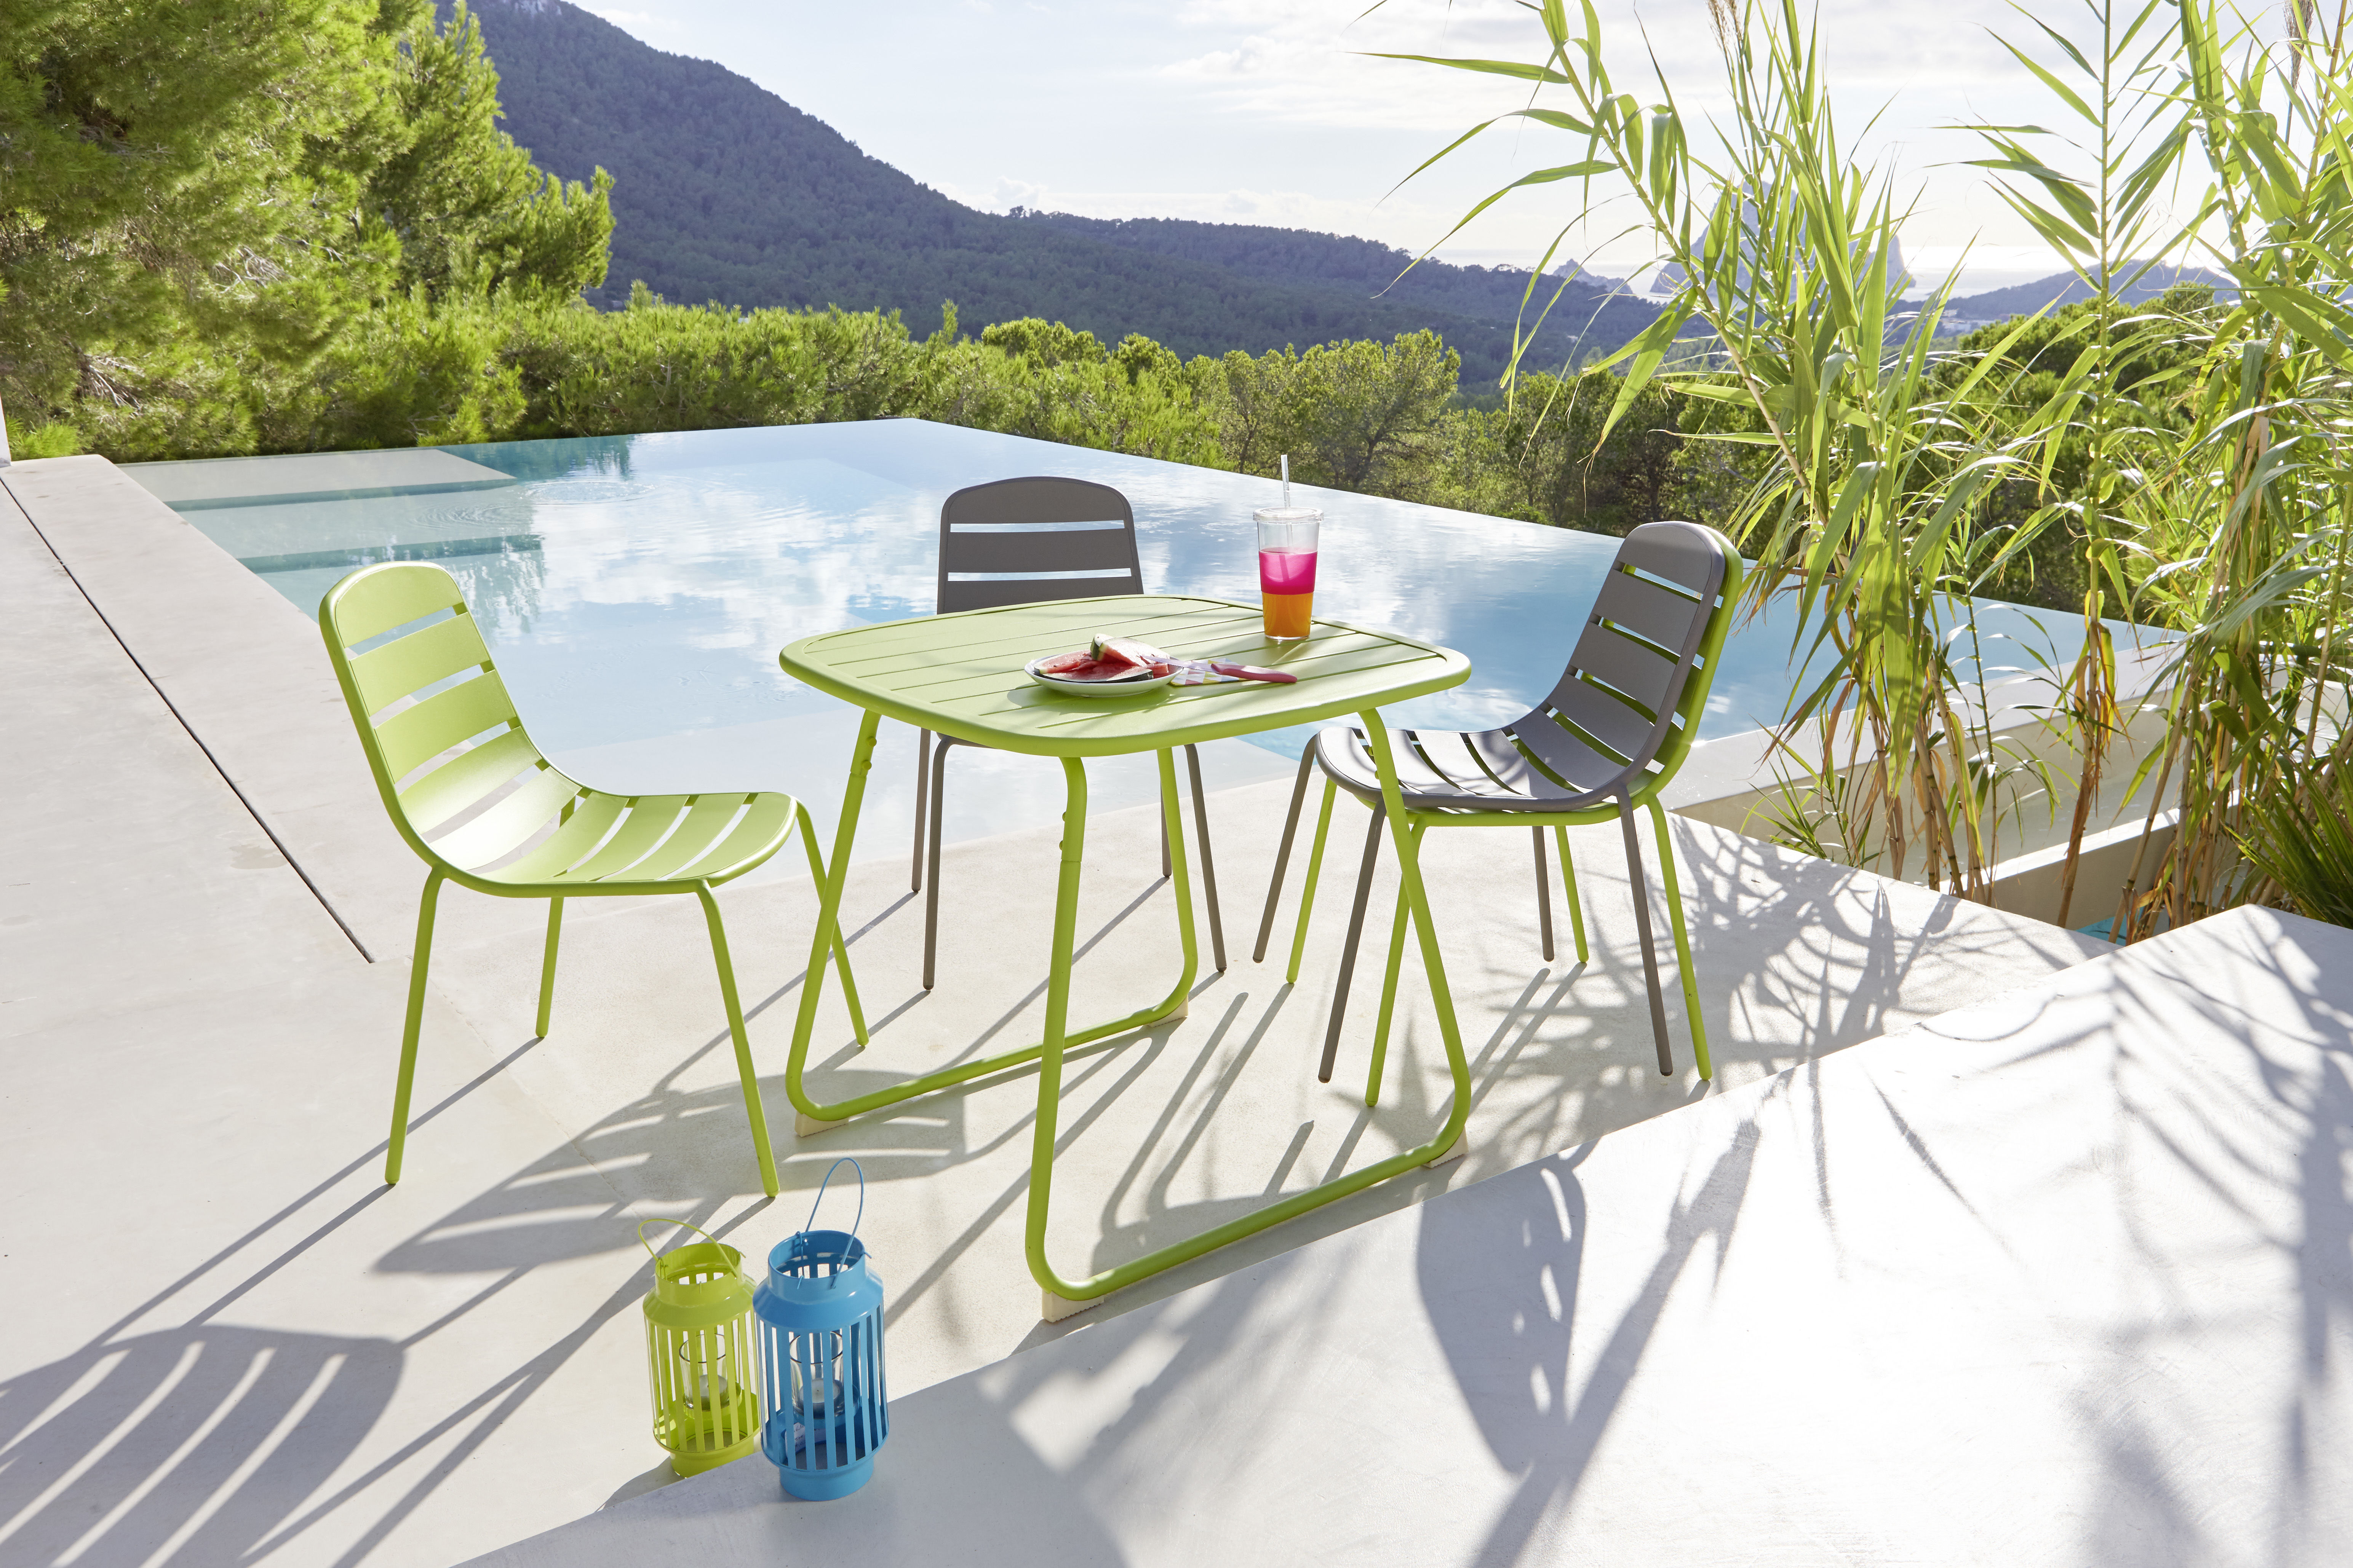 Table de jardin OPTIMISTIC - Acier - Vert